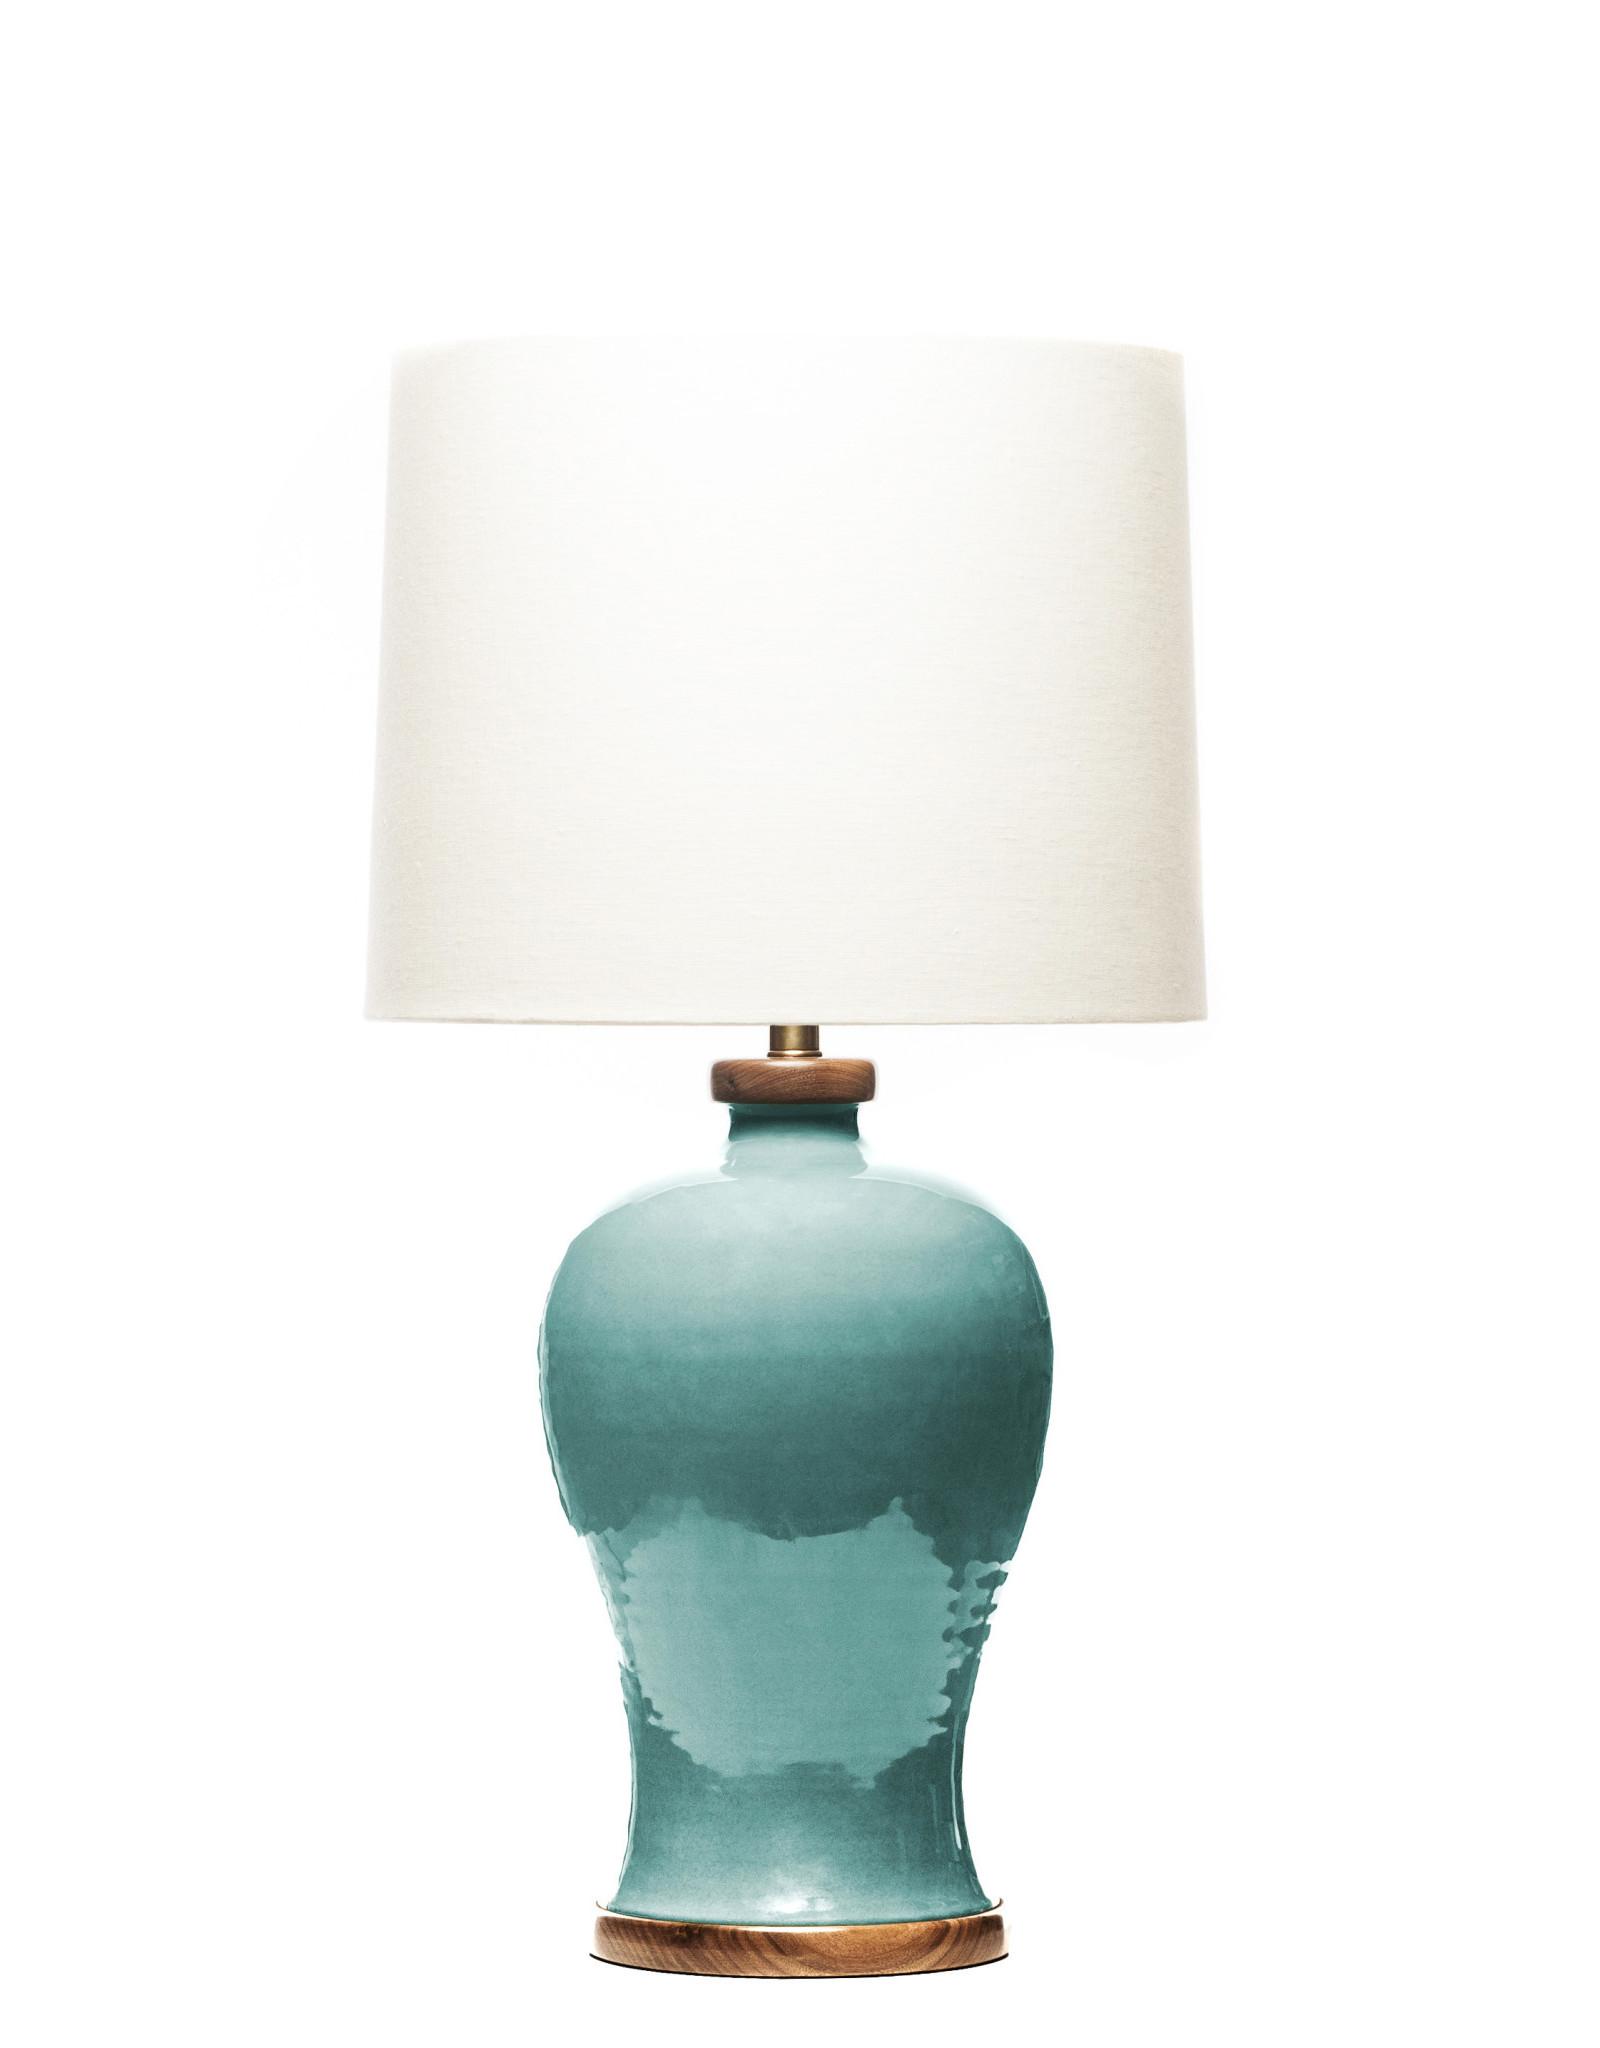 Lawrence & Scott Dashiell Table Lamp in Aquamarine (Walnut)